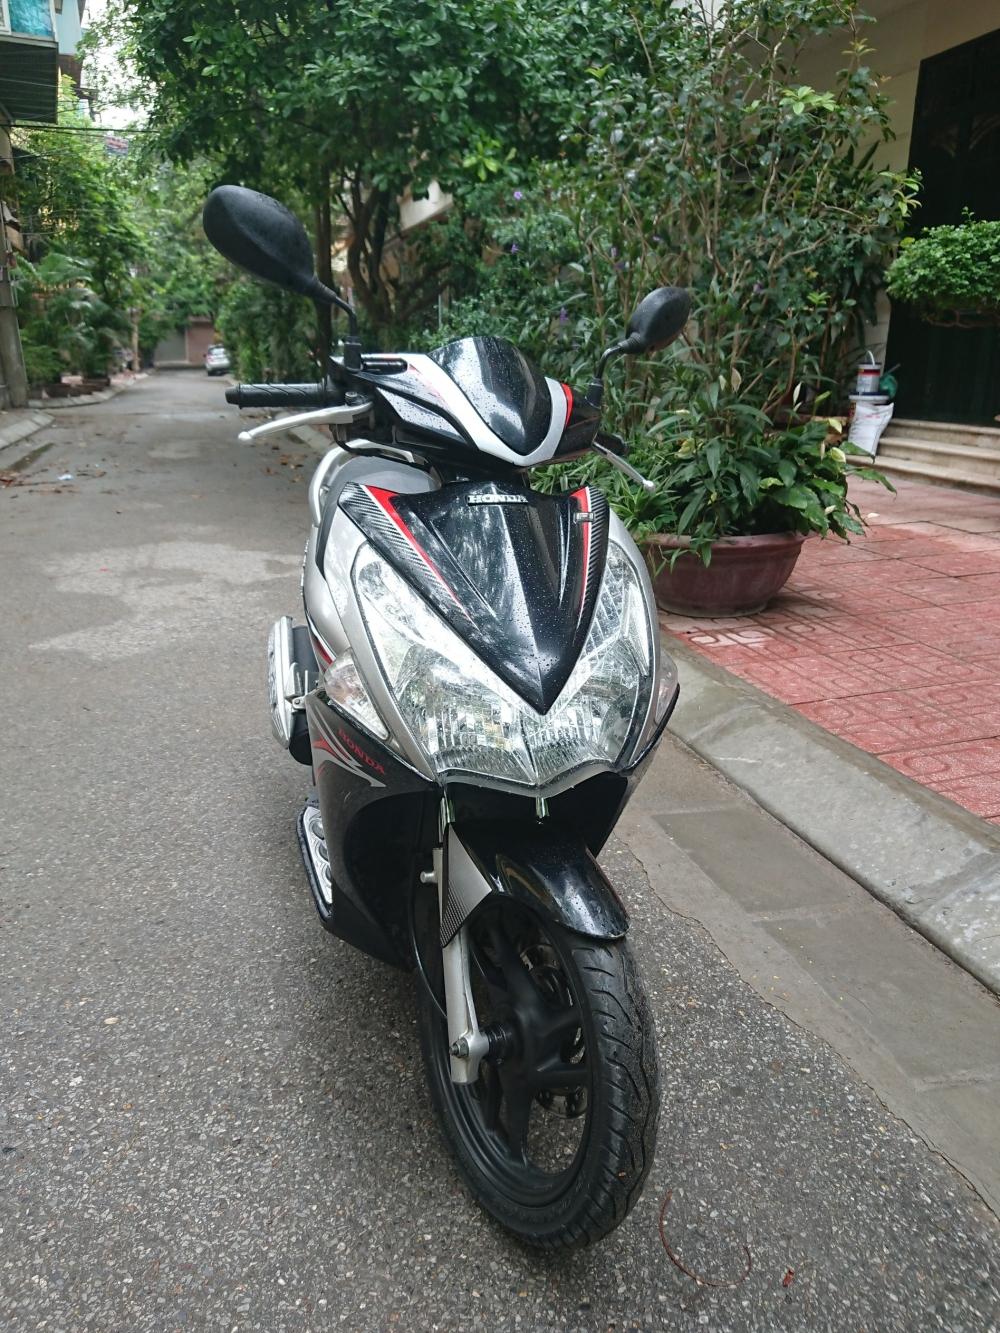 Can ban Honda Airblade fi 2012 chinh chu den bac con rat on dinh - 3